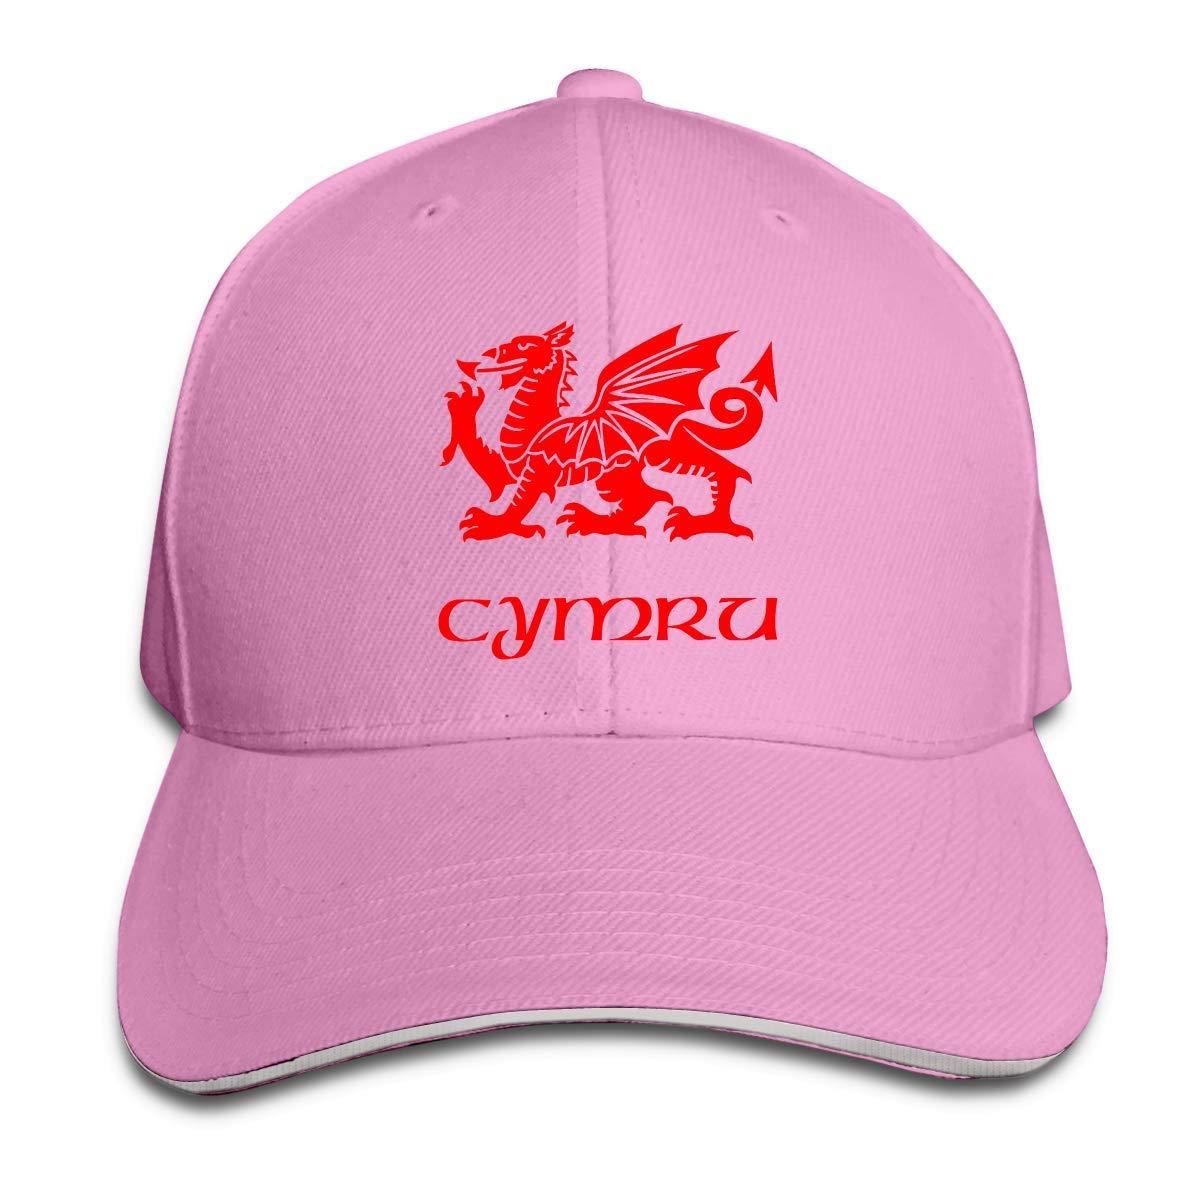 Nigmfgvnr Wales Welsh Dragon Yard Flag Unisex Adult Adjustable Peaked Sandwich Hats Trucker Cap Baseball Cap Black